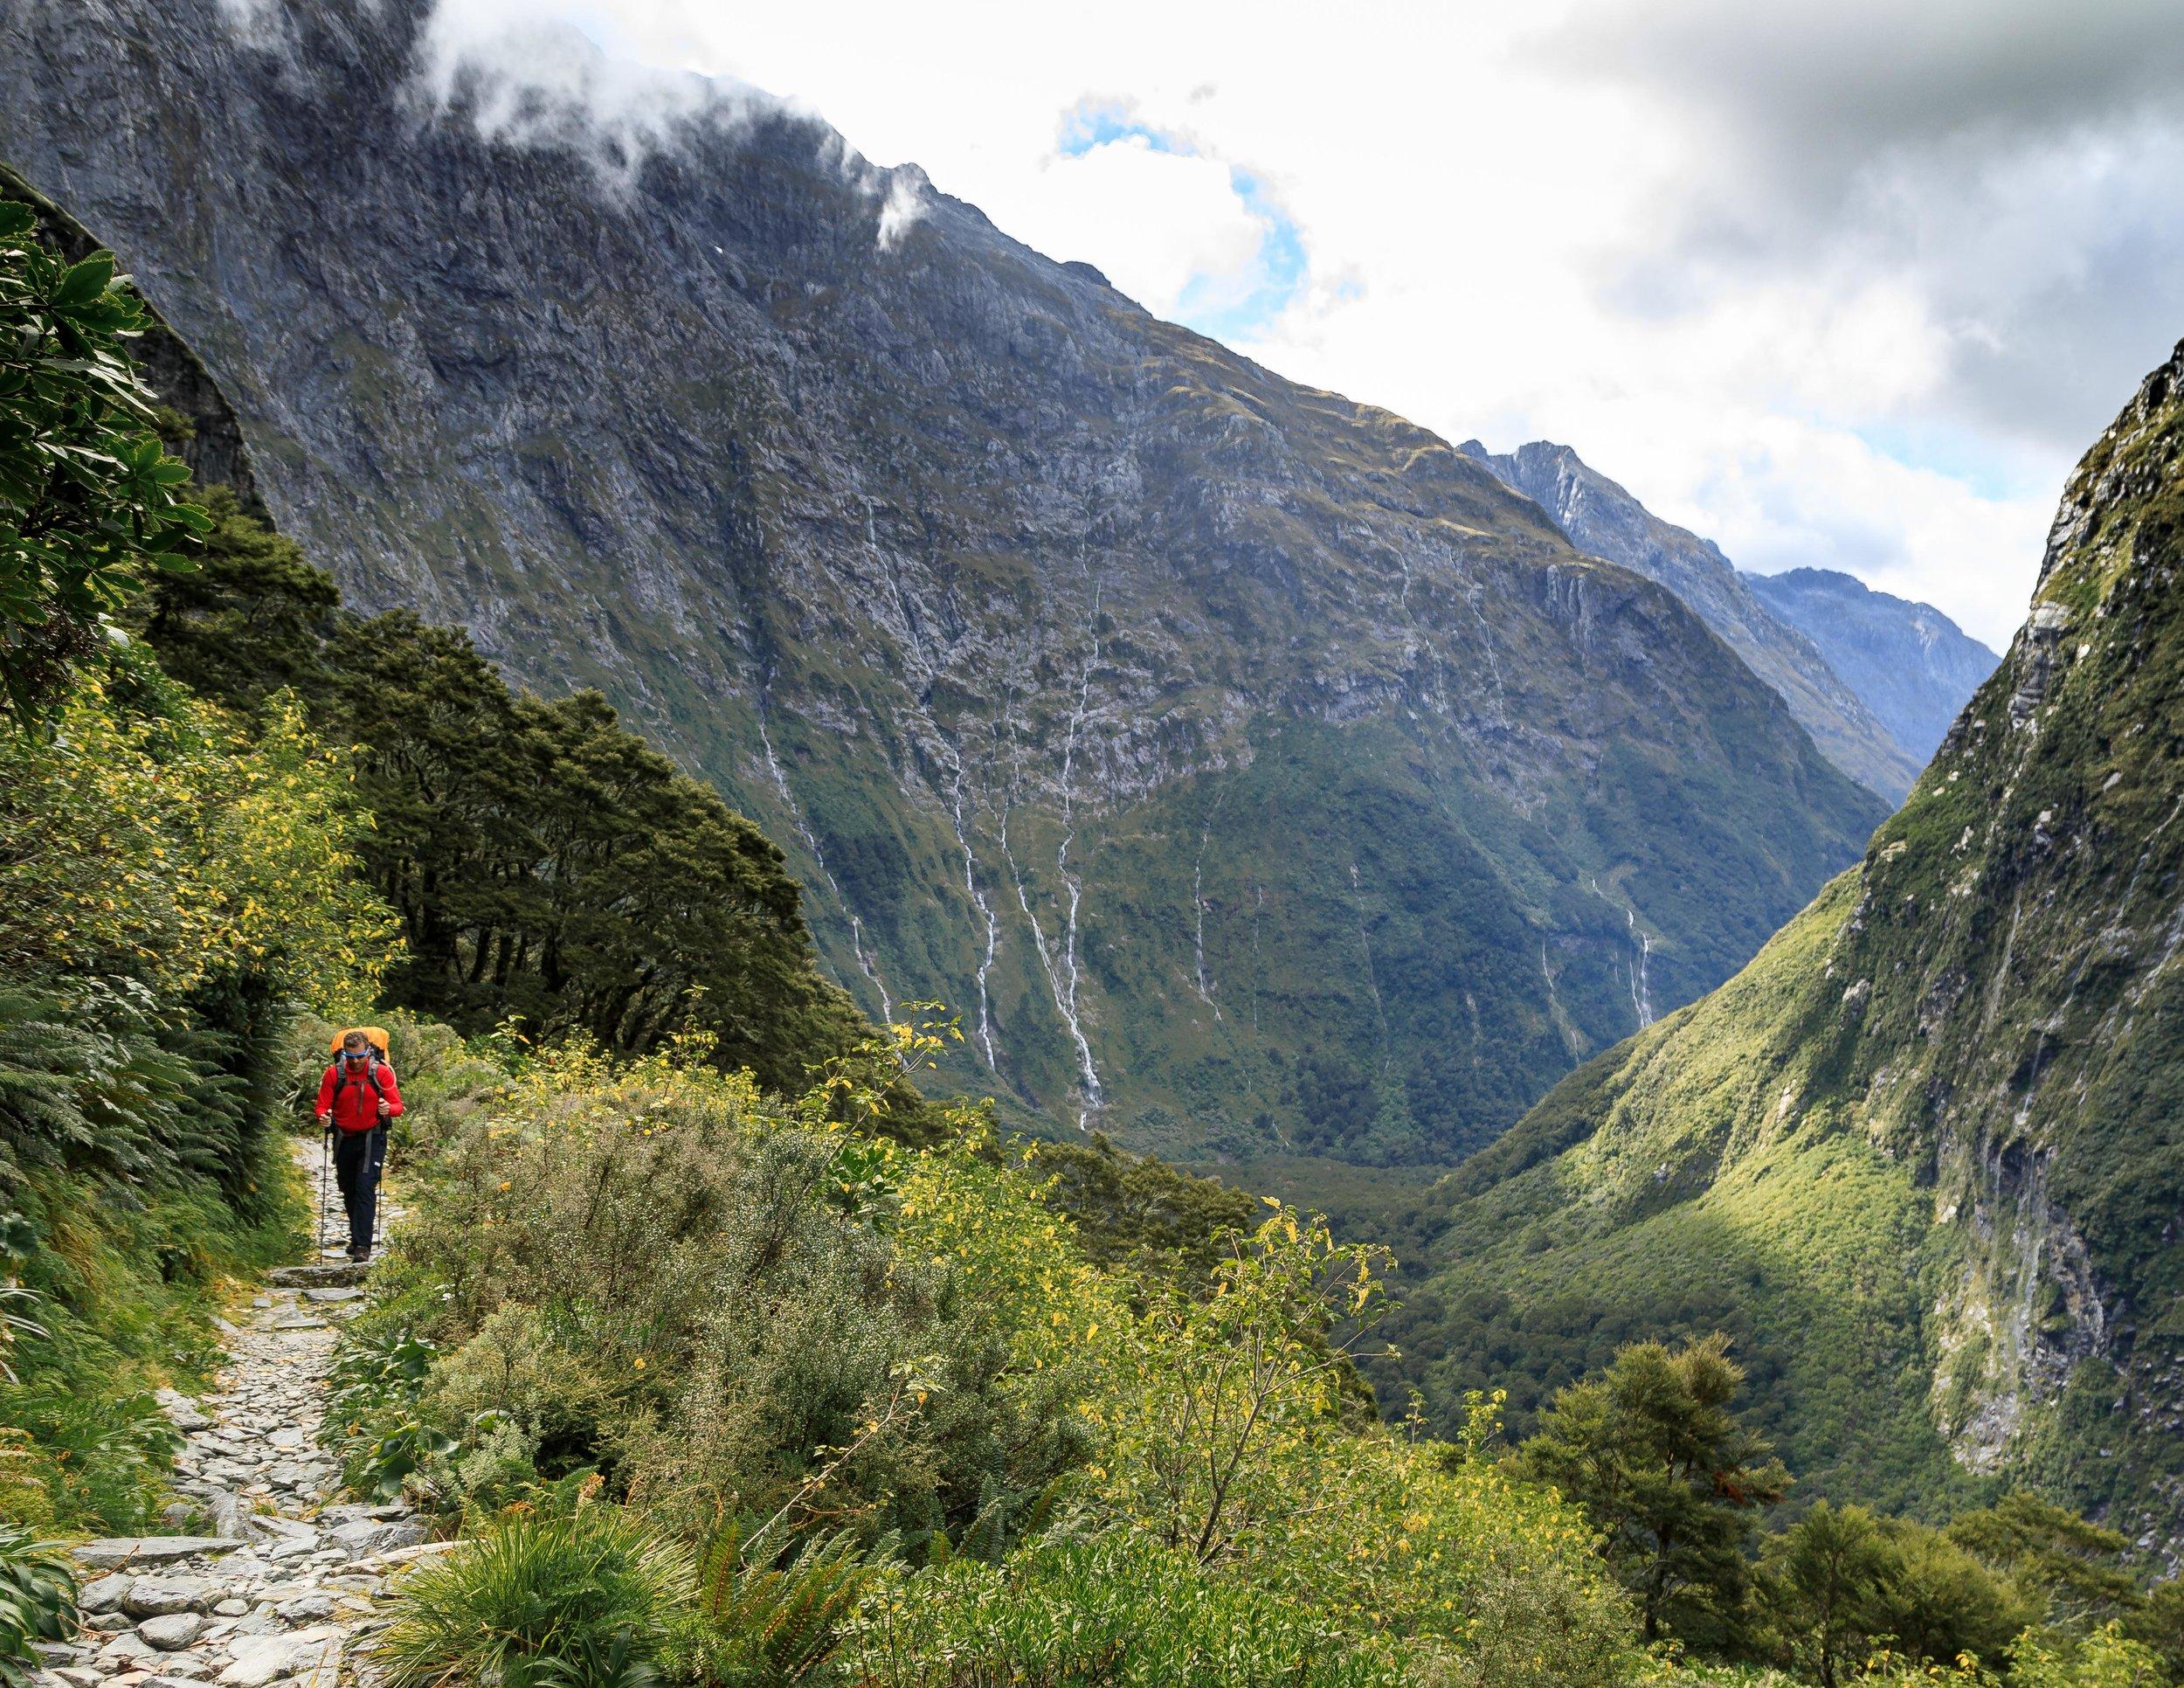 The Milford Track: Climbing the MacKinnon Pass